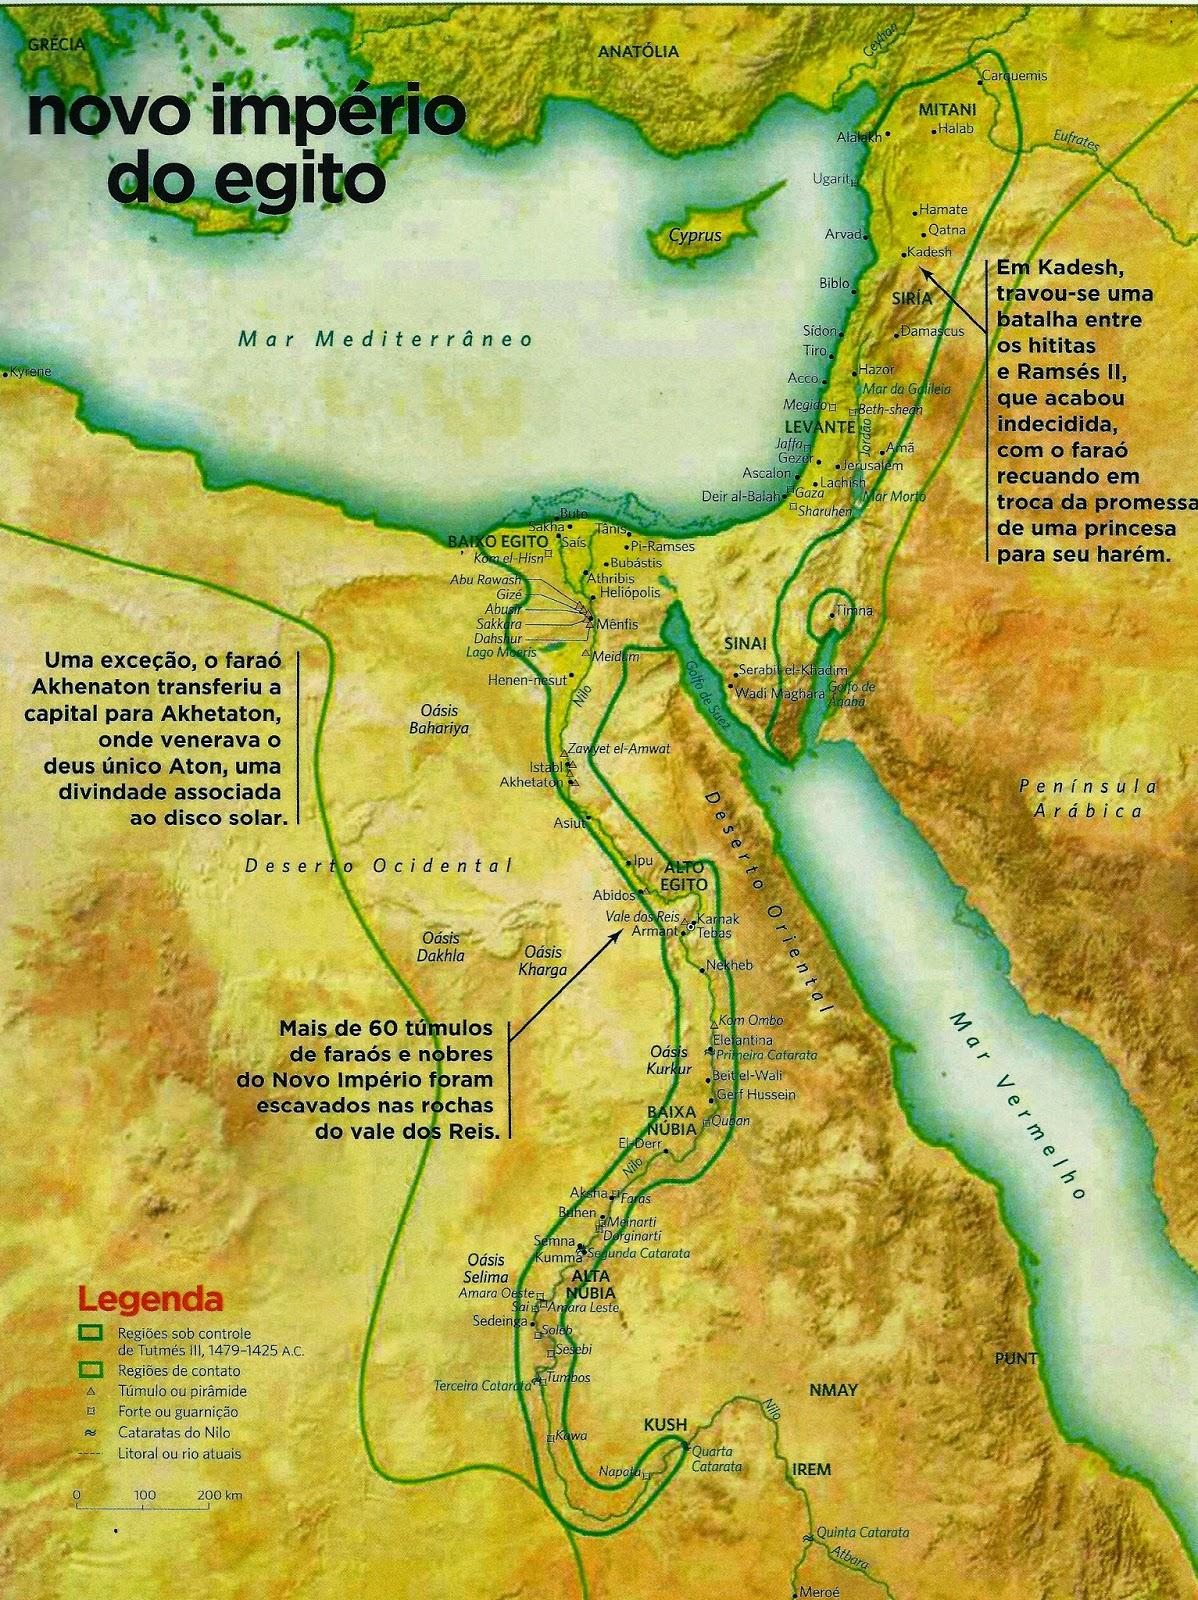 Histria Mundi Ramss II fara do Egito Antigo